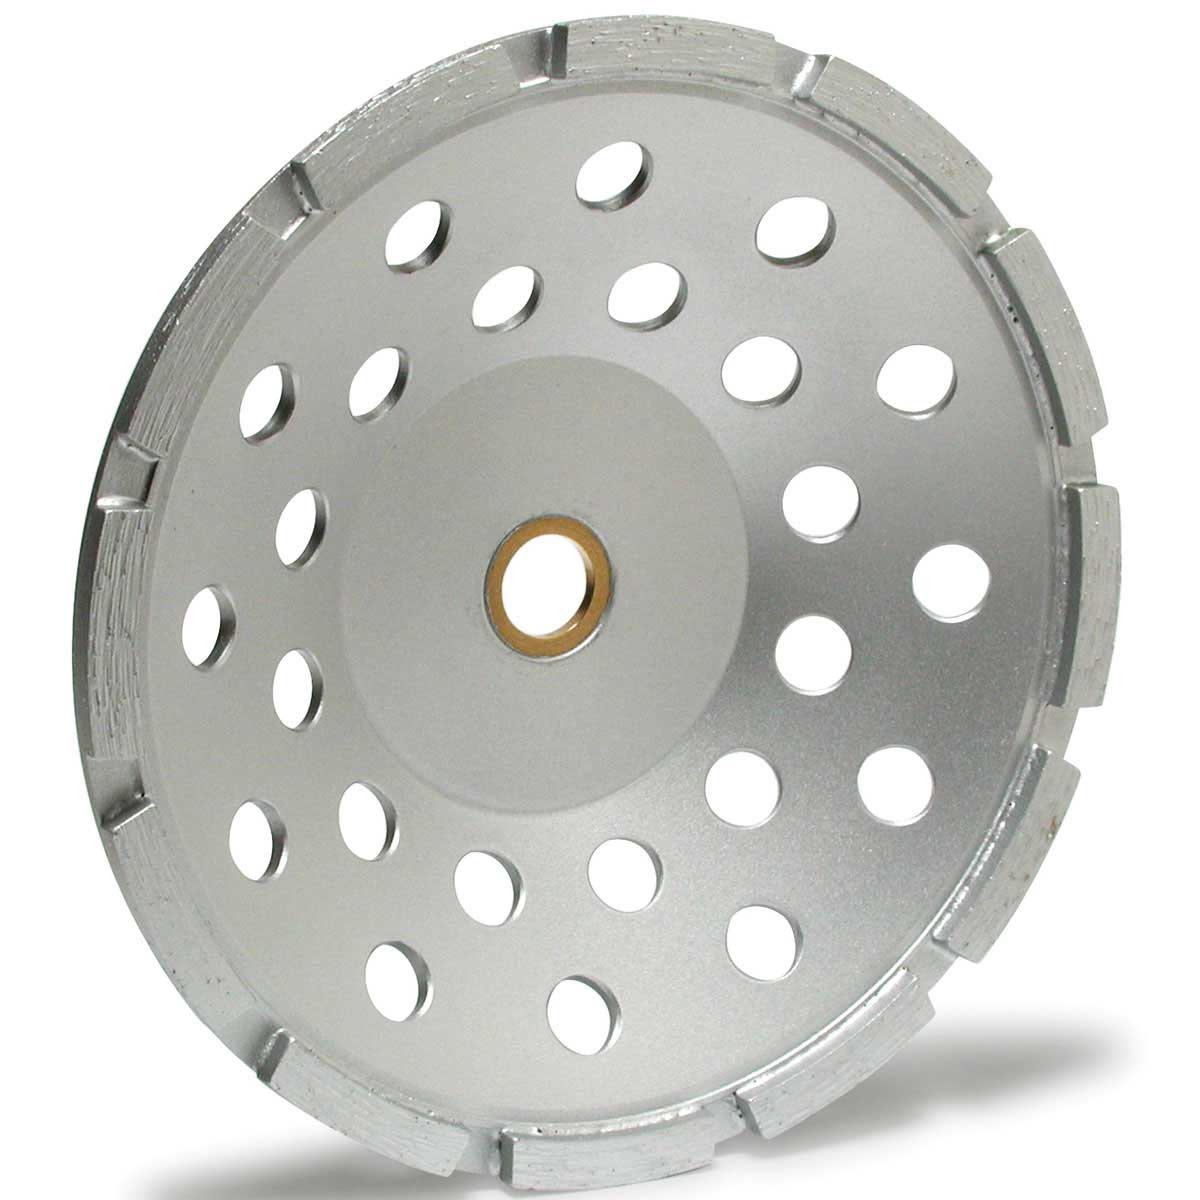 155684 MK-304CG1 Cup Wheel